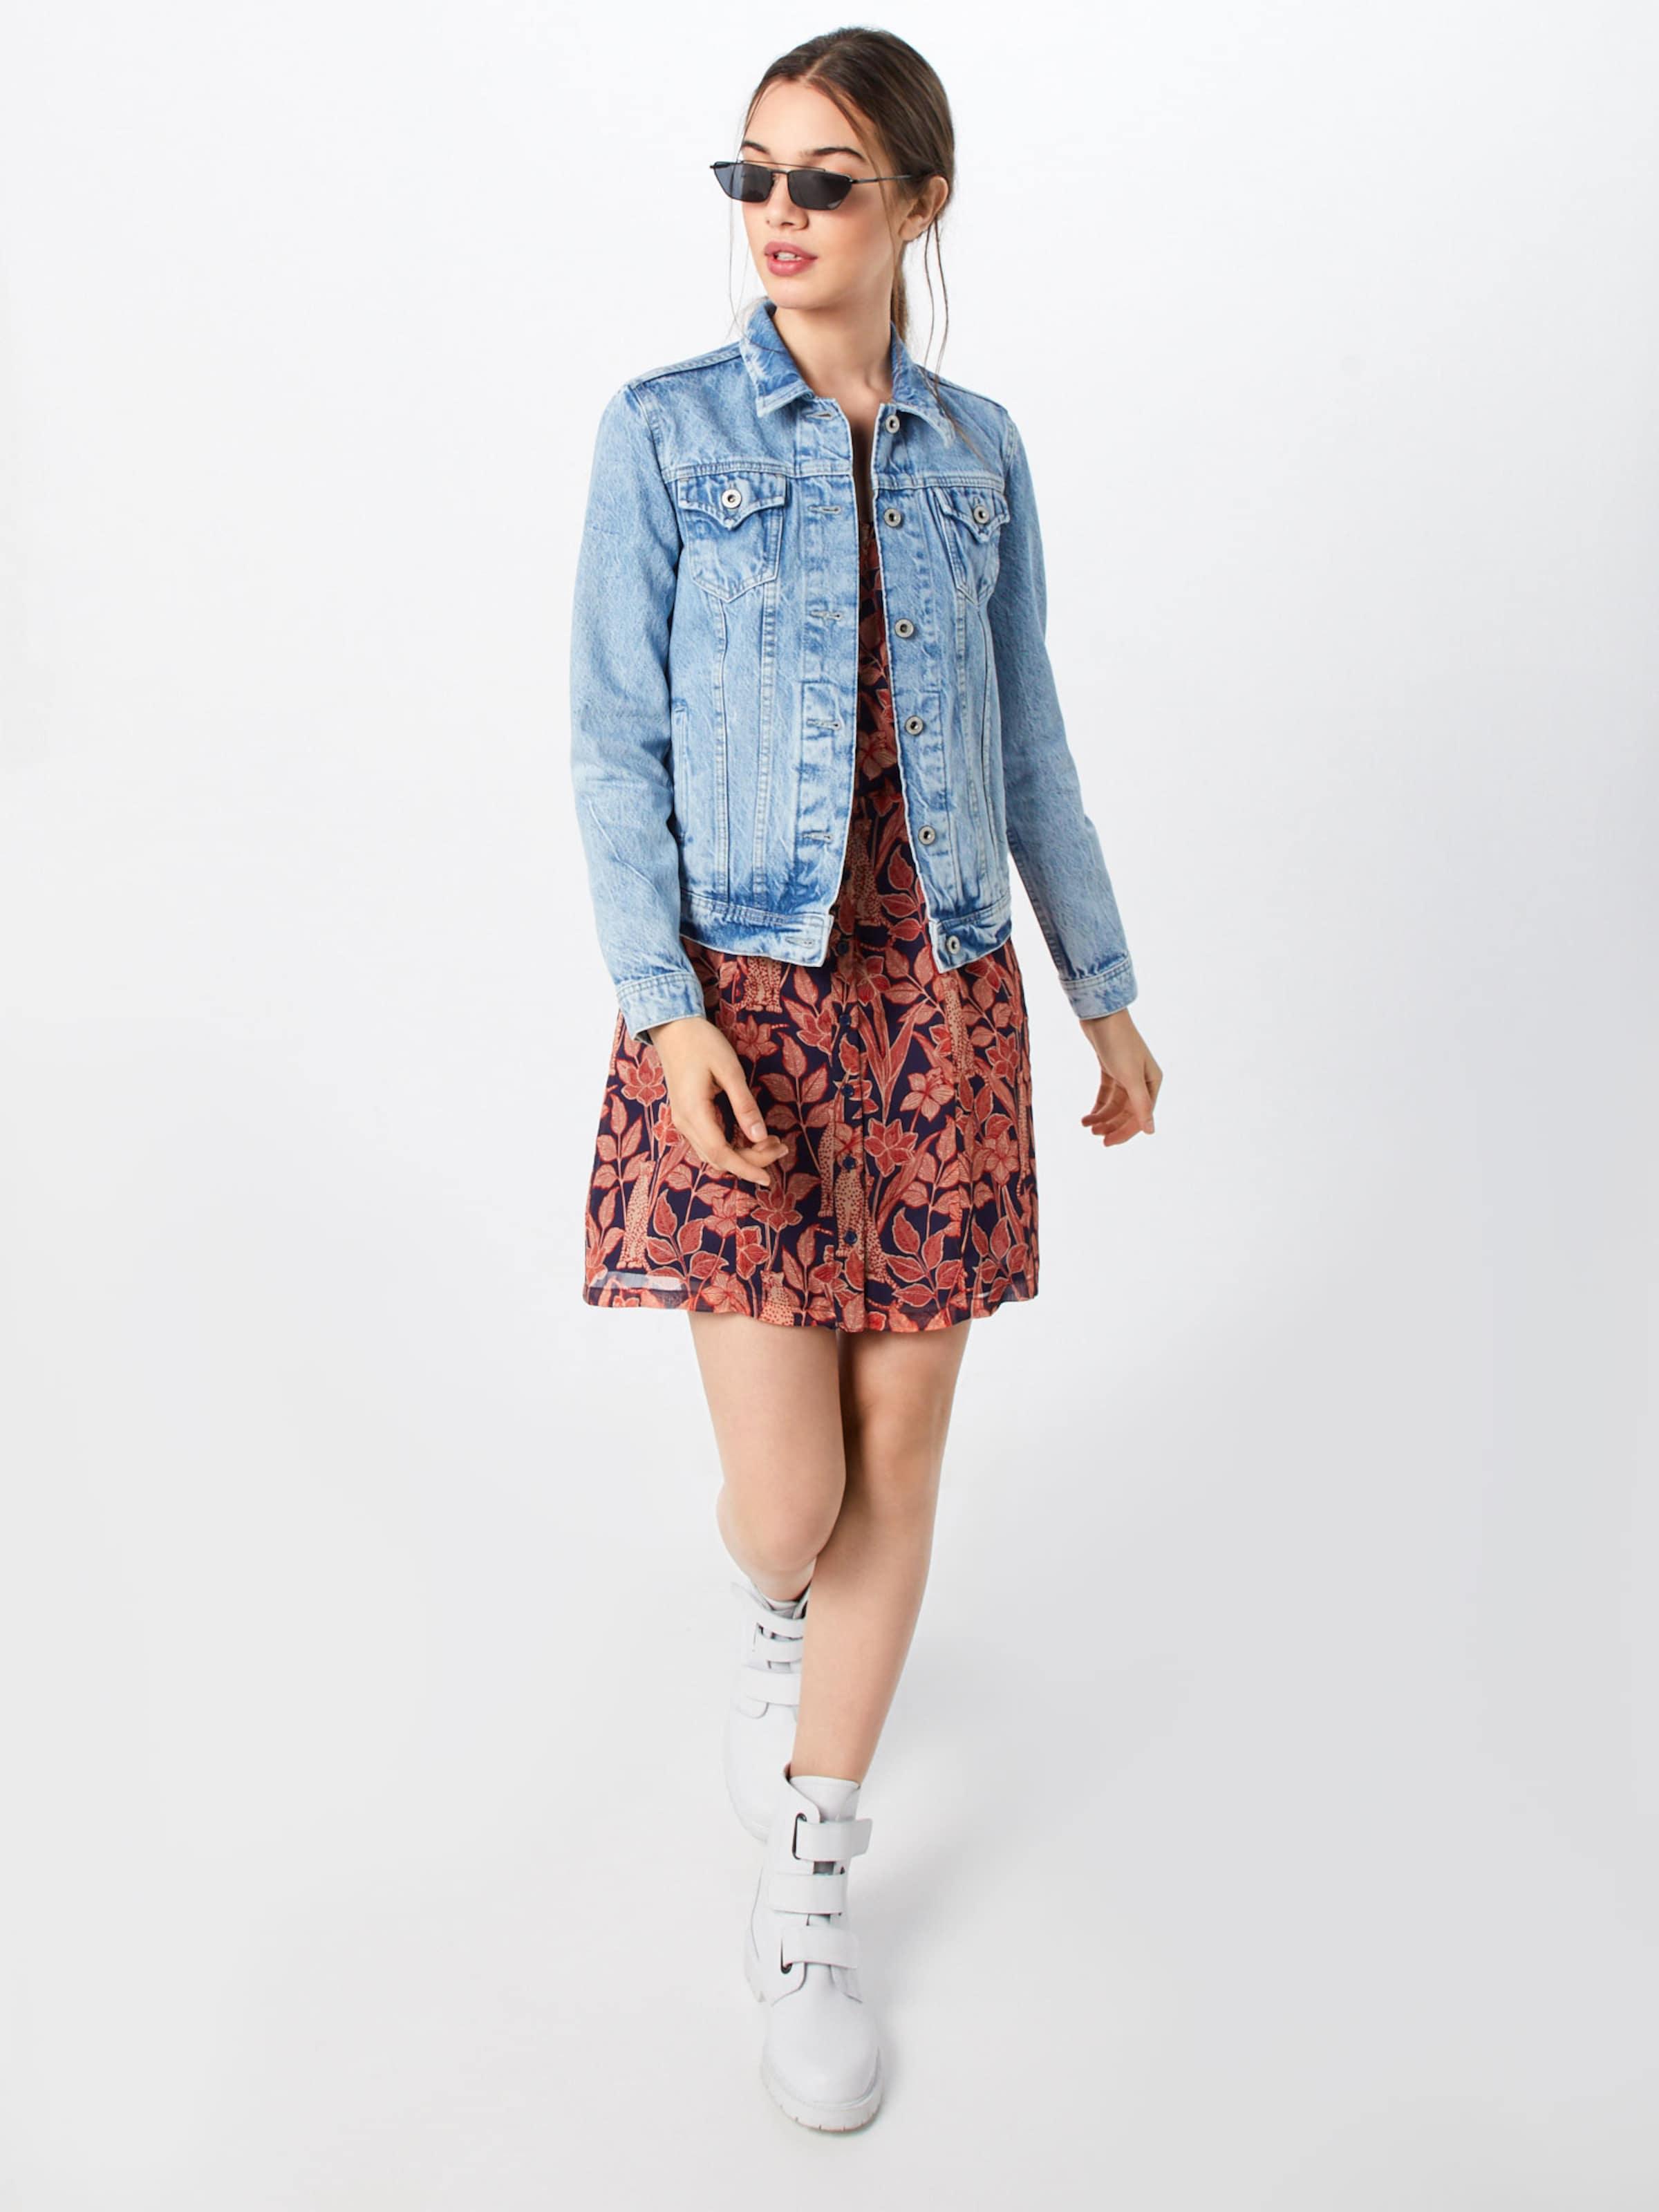 'thrift' Pepe Denim Jeans In Jacke Blue vm08wnyNO